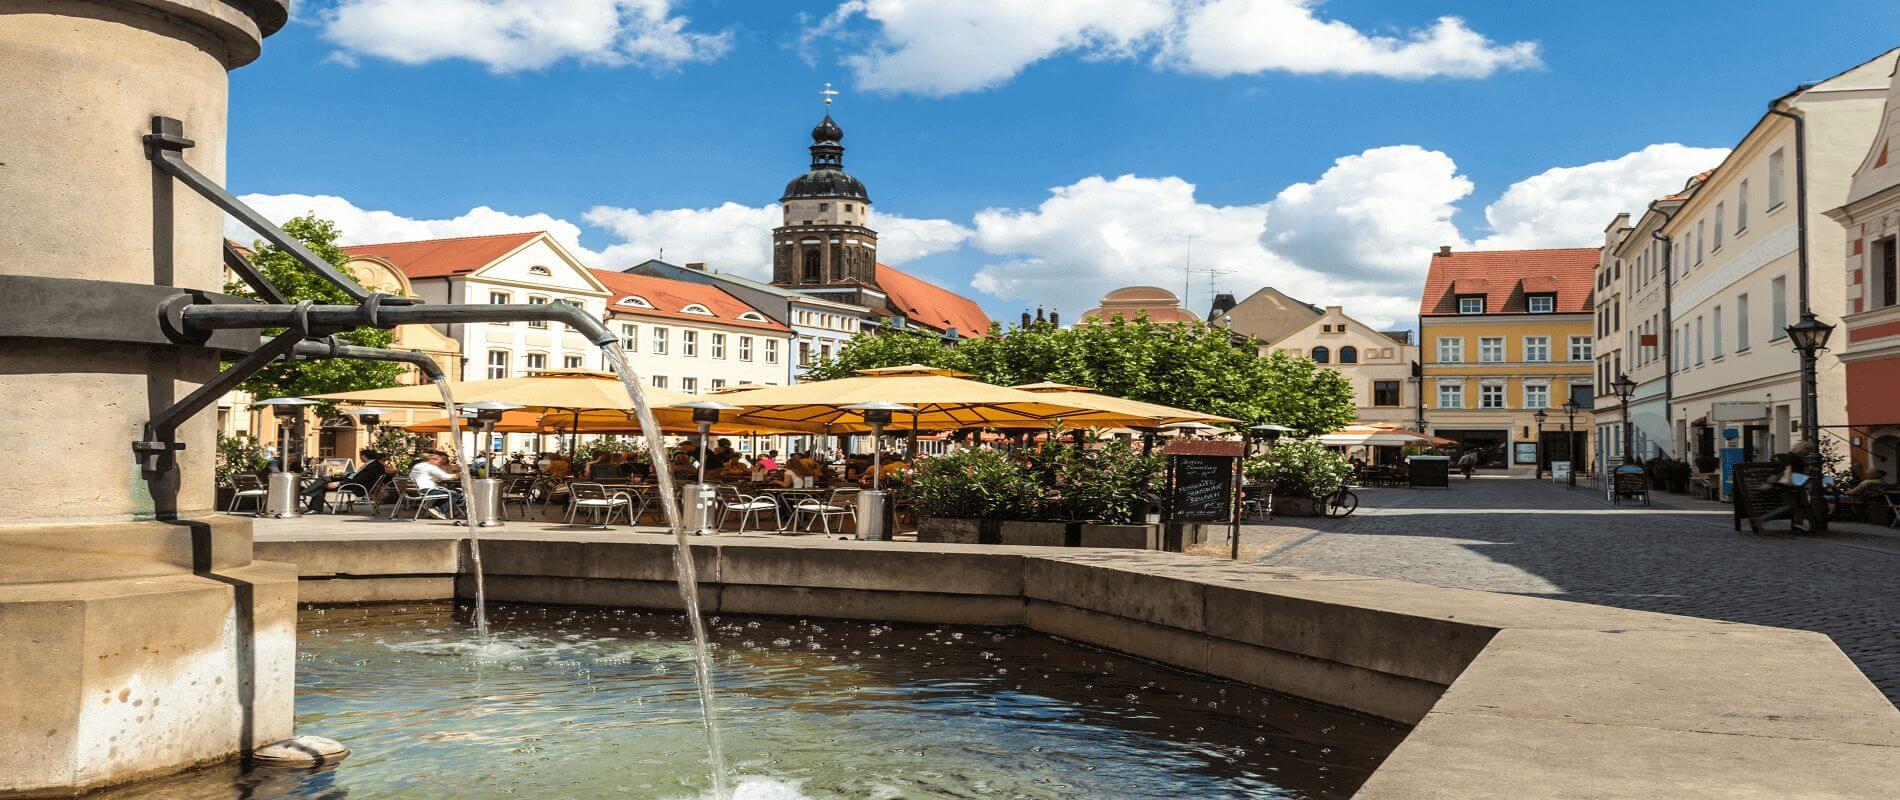 Smart City Cottbus - Smart City Atlas Deutschland